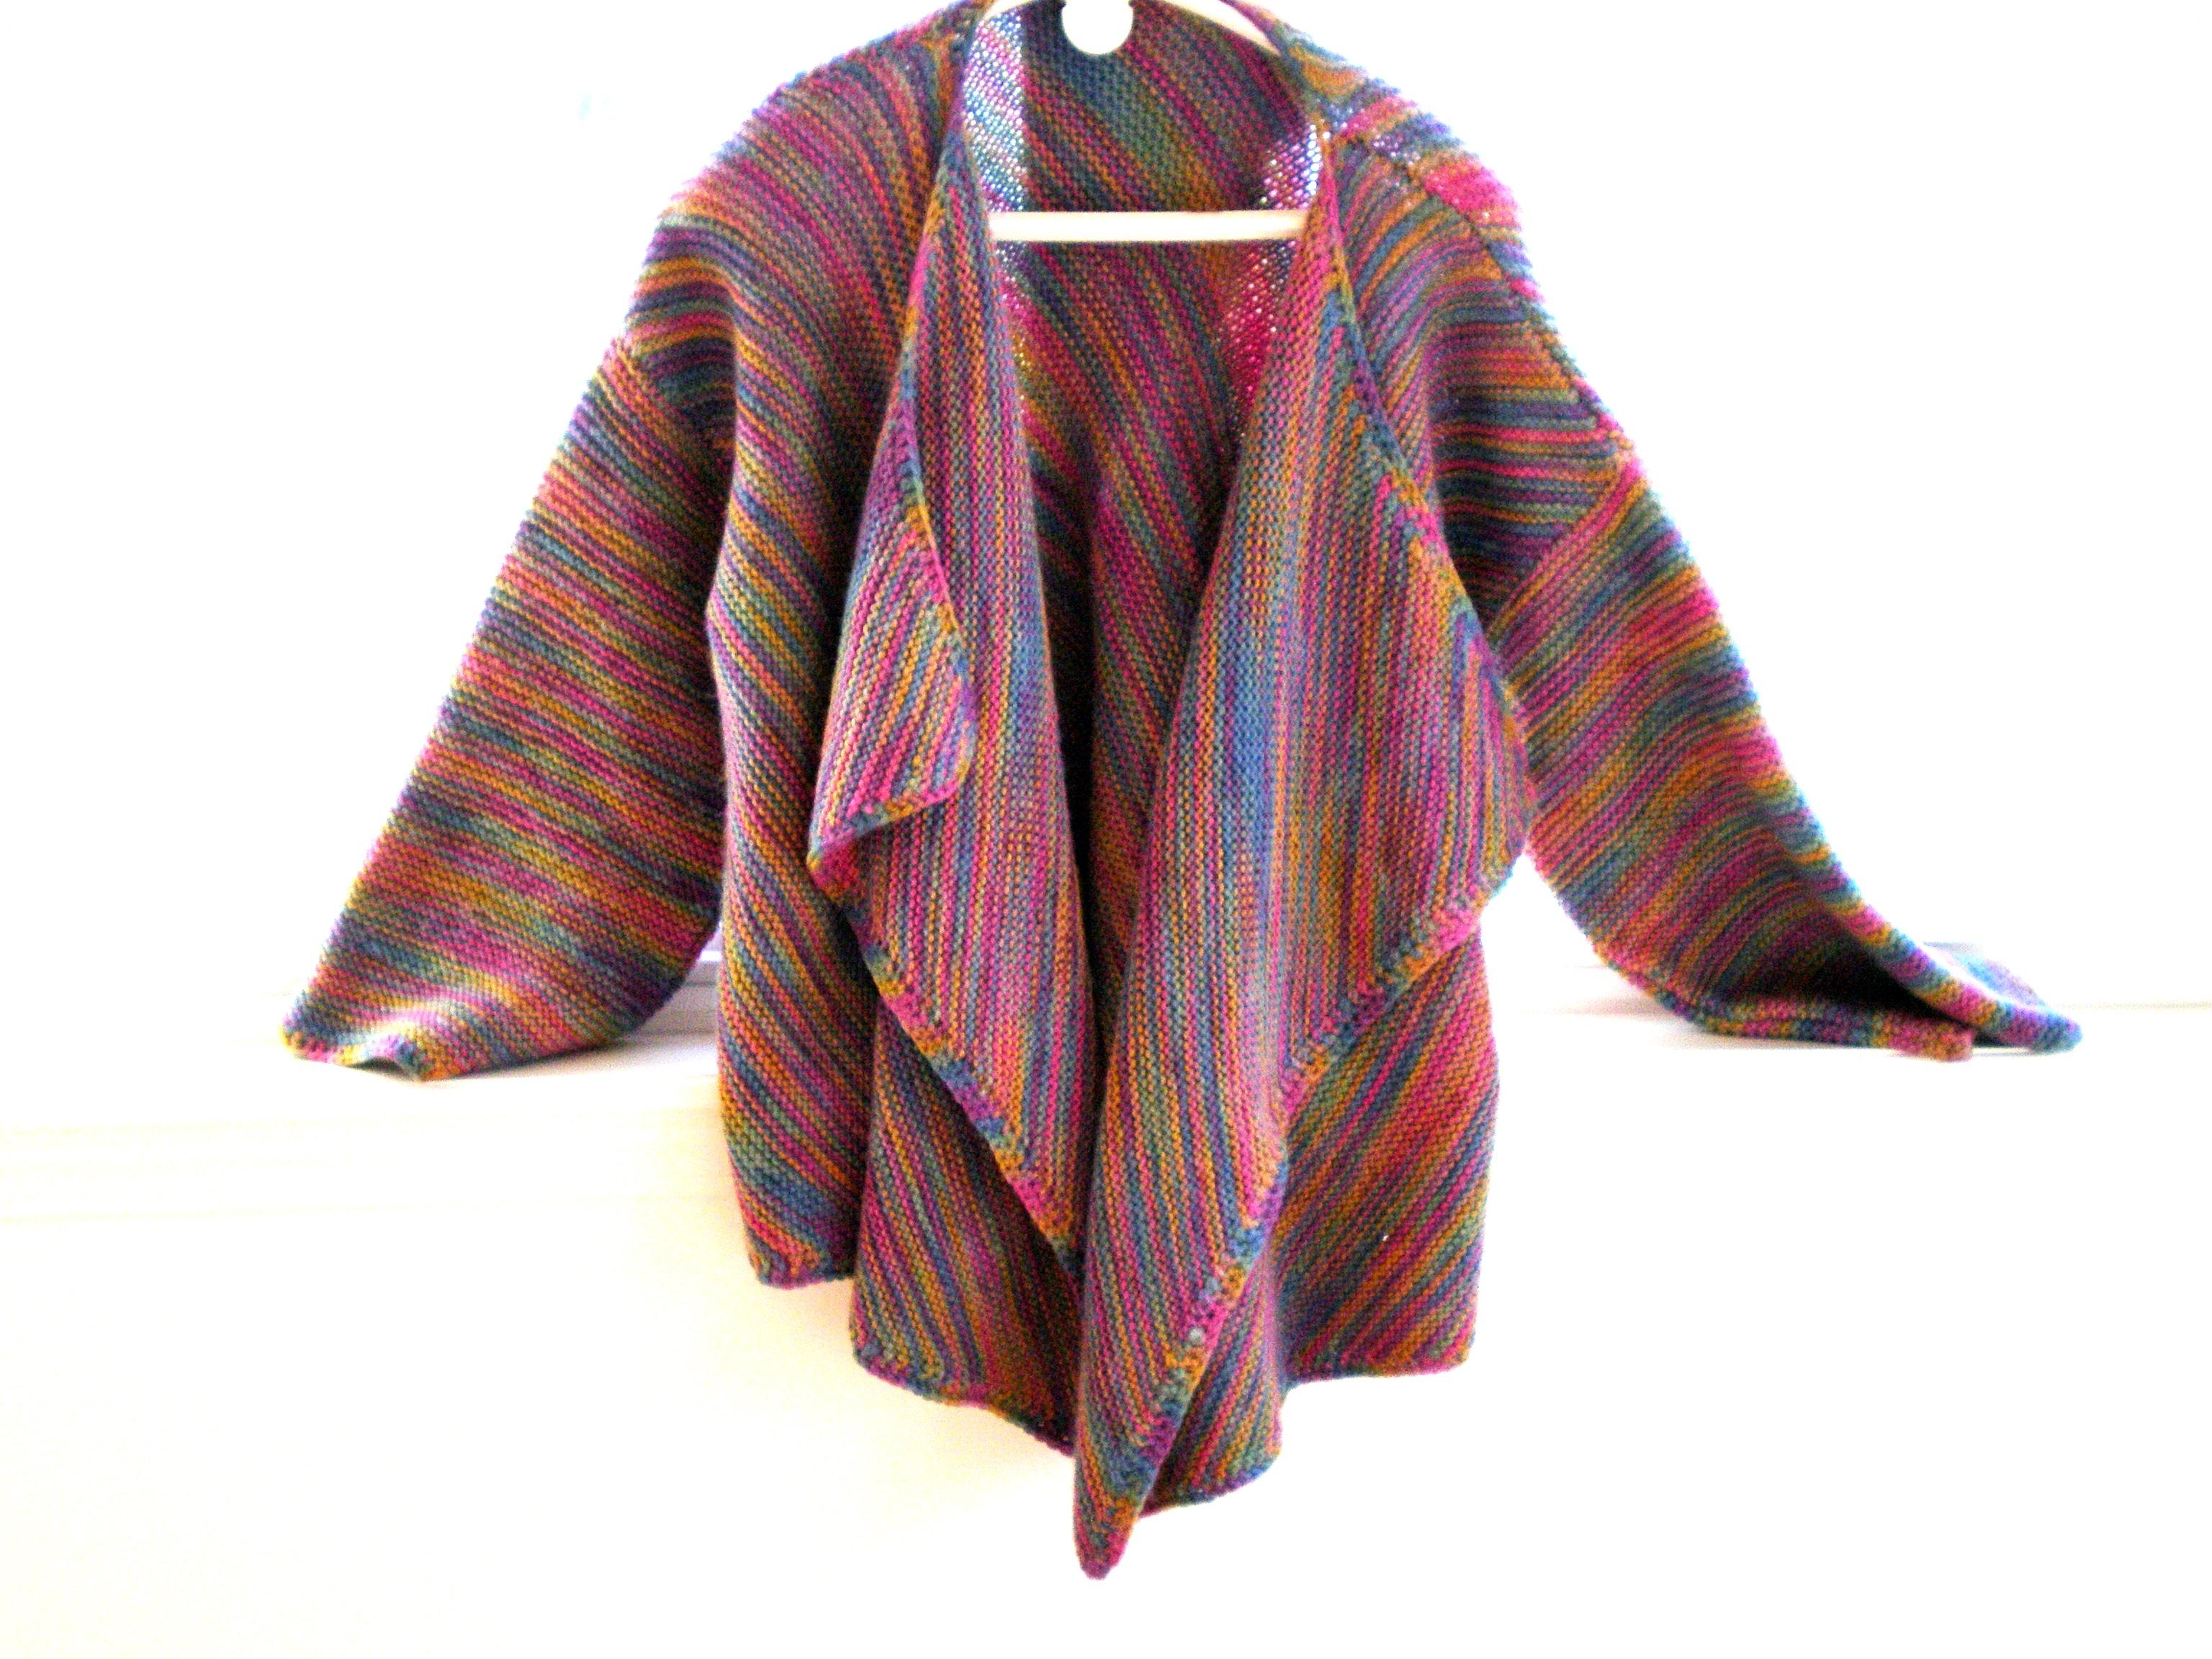 e3433469353fb TintiTypes  Tinti s Knitting Patterns